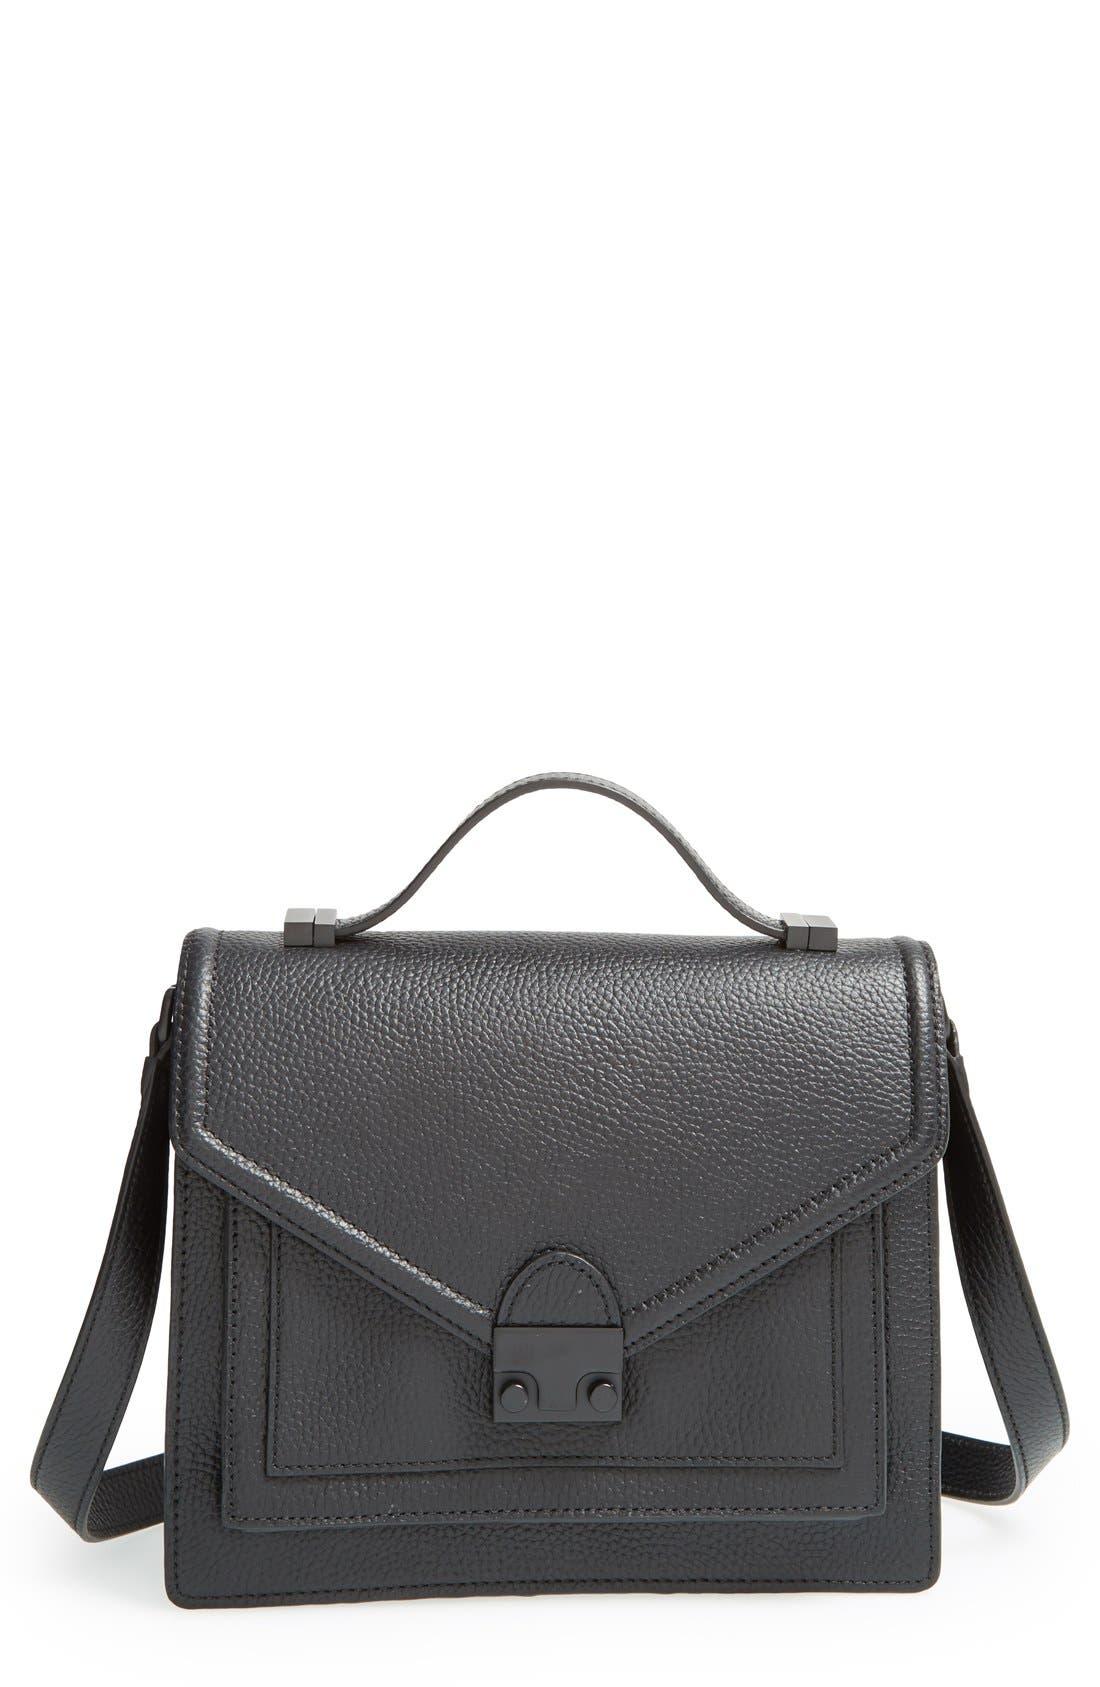 LOEFFLER RANDALL 'Medium Rider' Leather Top Handle Satchel, Main, color, 001